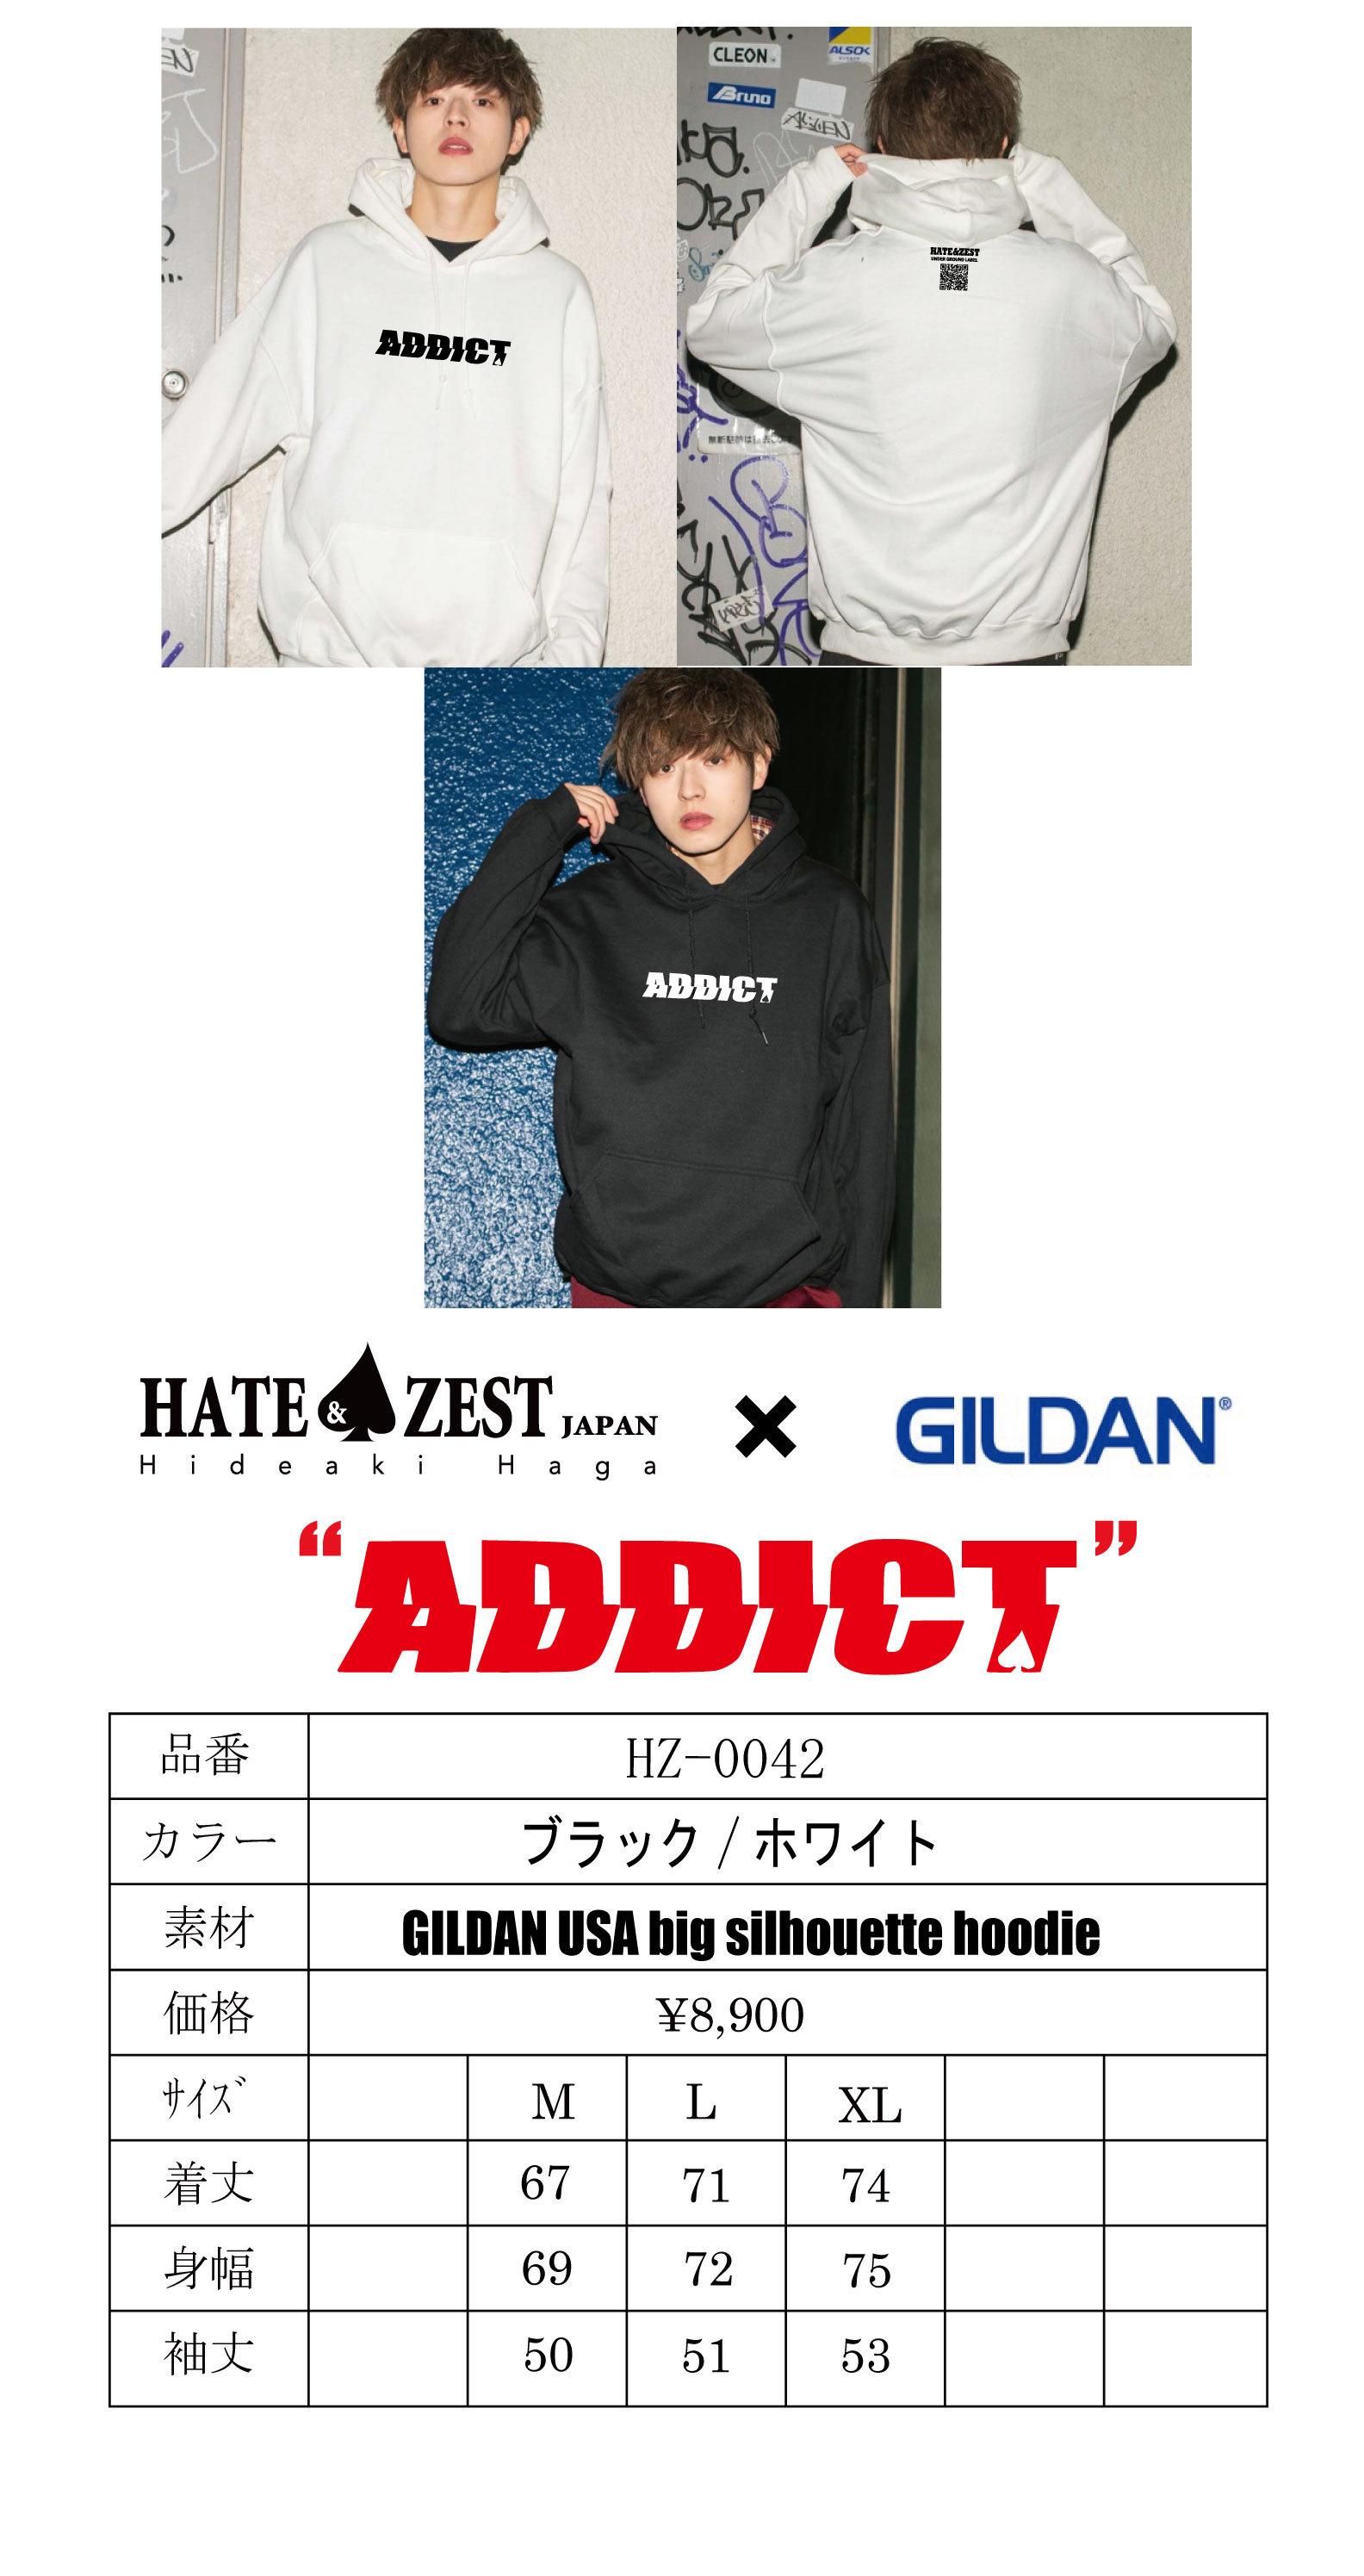 HATE&ZEST 10th Anniversary 第二弾 詳細_b0335651_15083397.jpg